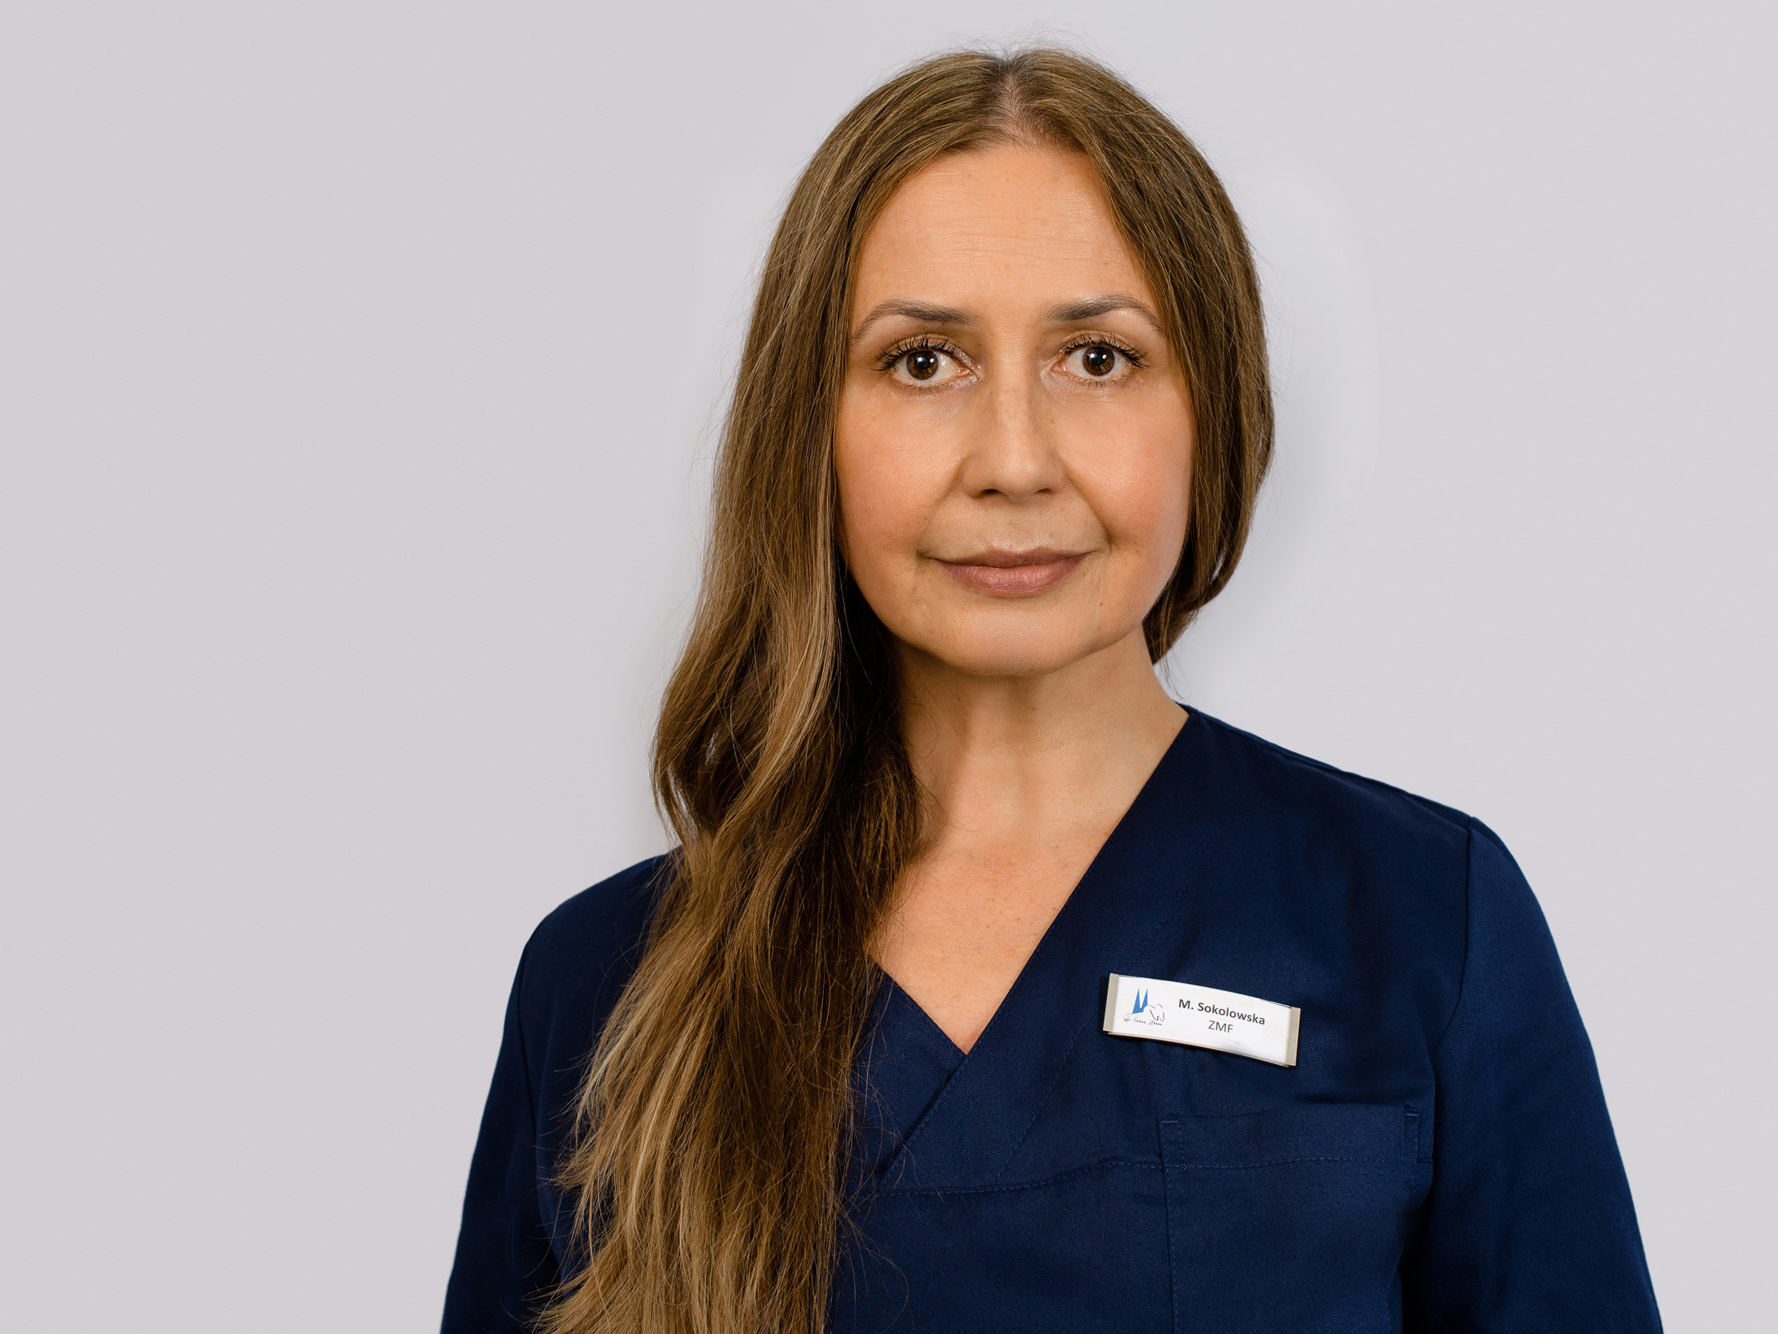 Malgorzata Sokolowska, Prophylaxemanagerin (IHK), Individualprophylaxe & parodontale Vorbehandlung!